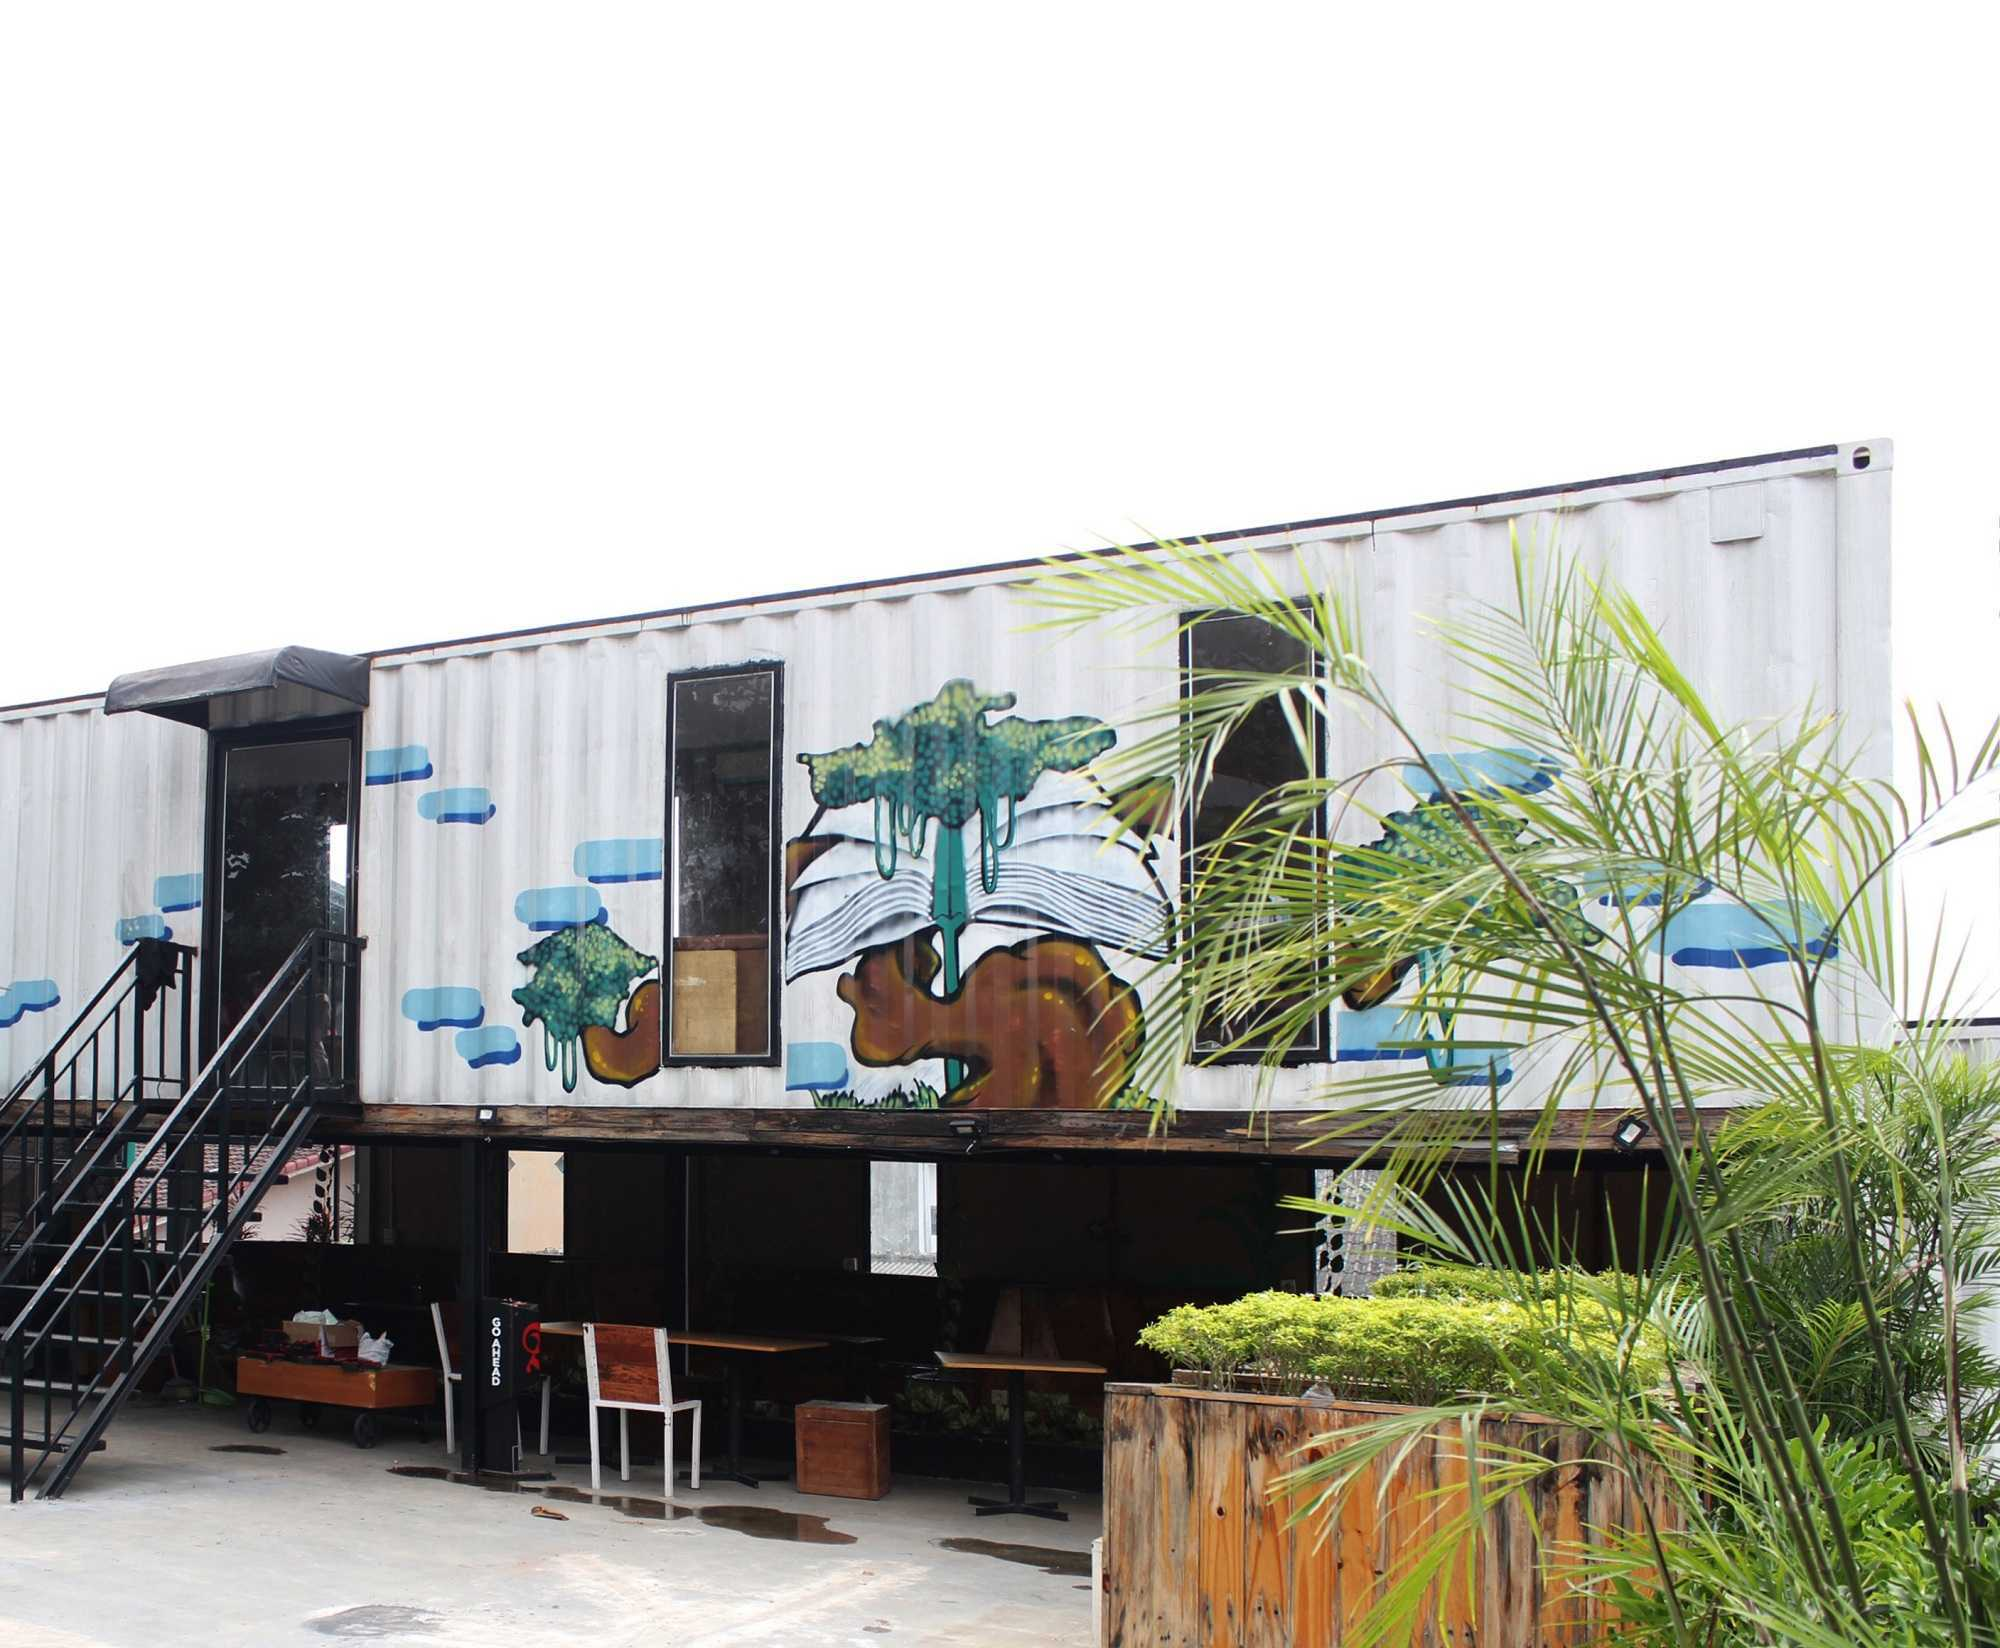 Braun Studio Northstars Cafe Medan Jl. Jamin Ginting, Padang Bulan, Medan Baru, Kota Medan, Sumatera Utara 20157, Indonesia Medan Sisingamangaraja Braun-Studio-Northstars-Cafe-Medan   57173